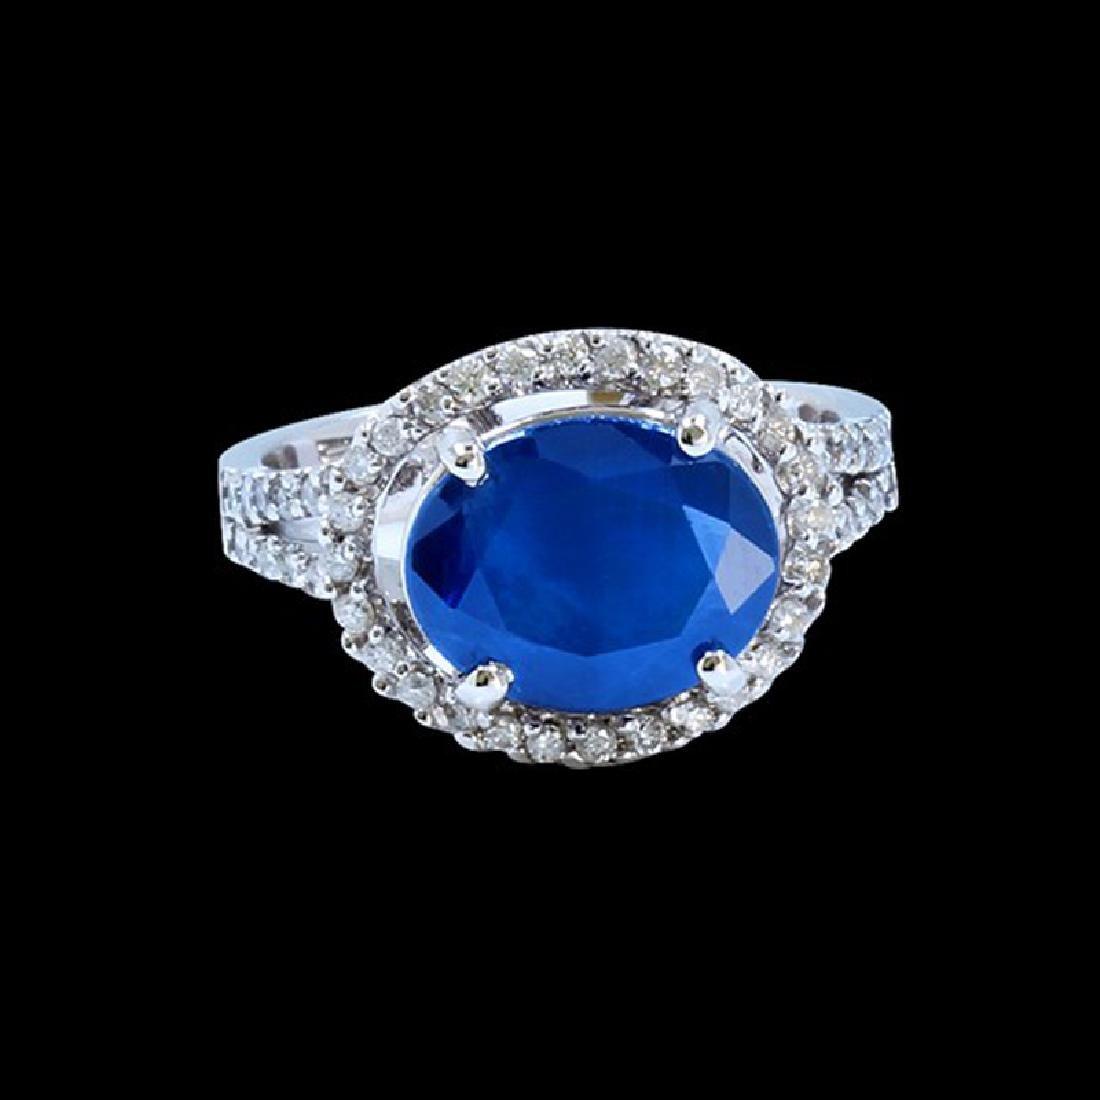 4.76CT NATURAL CEYLON BLUE SAPPHIRE 14K W/G RING